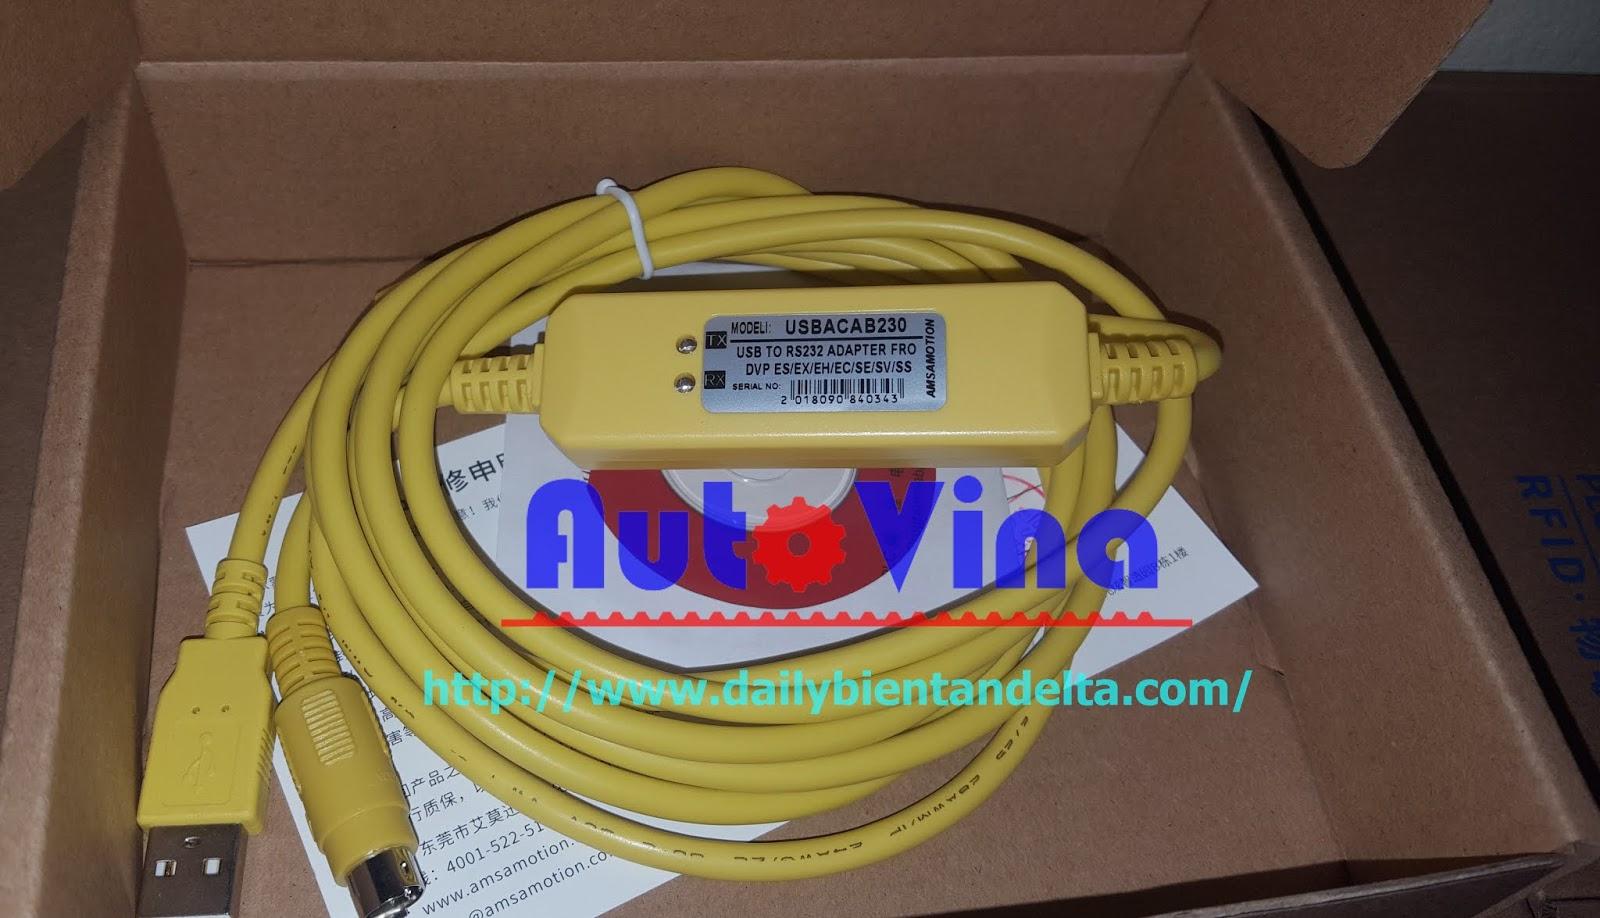 Cable lập trình PLC Delta USBACAB2A30, cable nạp chương trình PLC Delta RS232